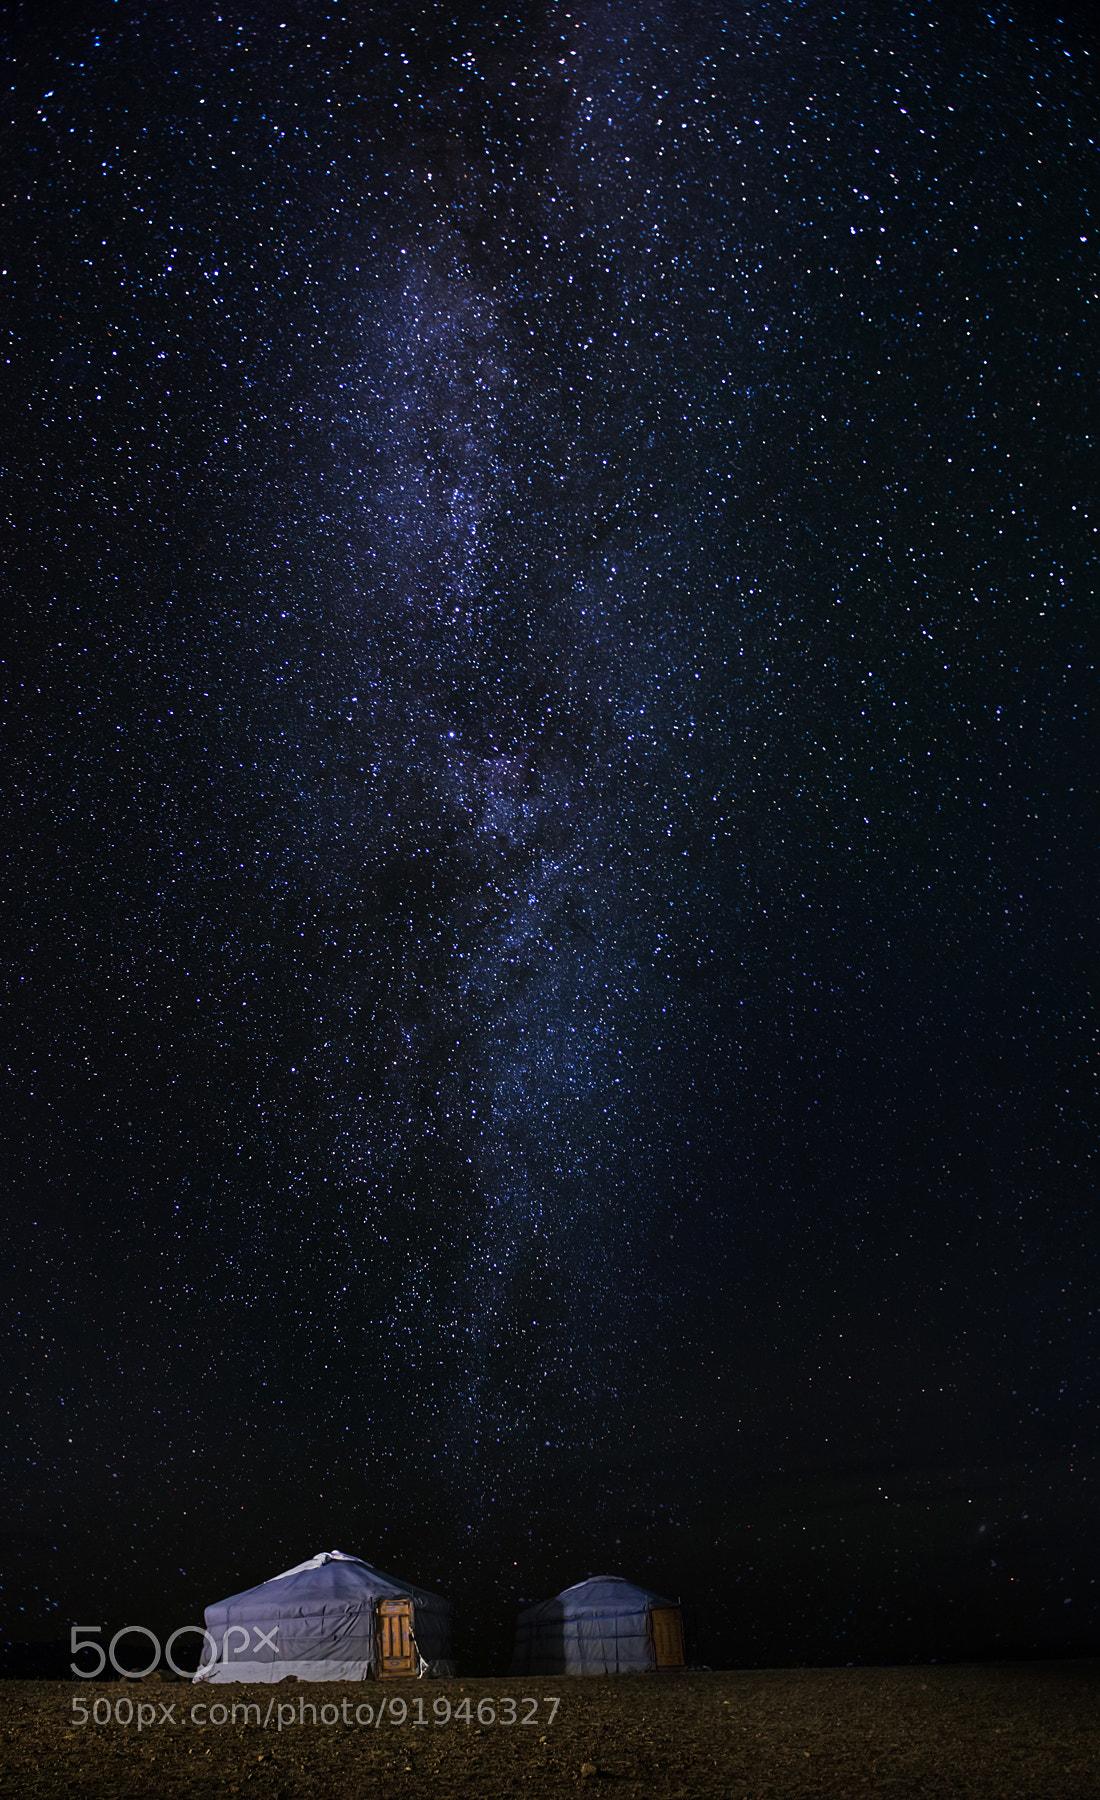 Infinite space - Magazine cover